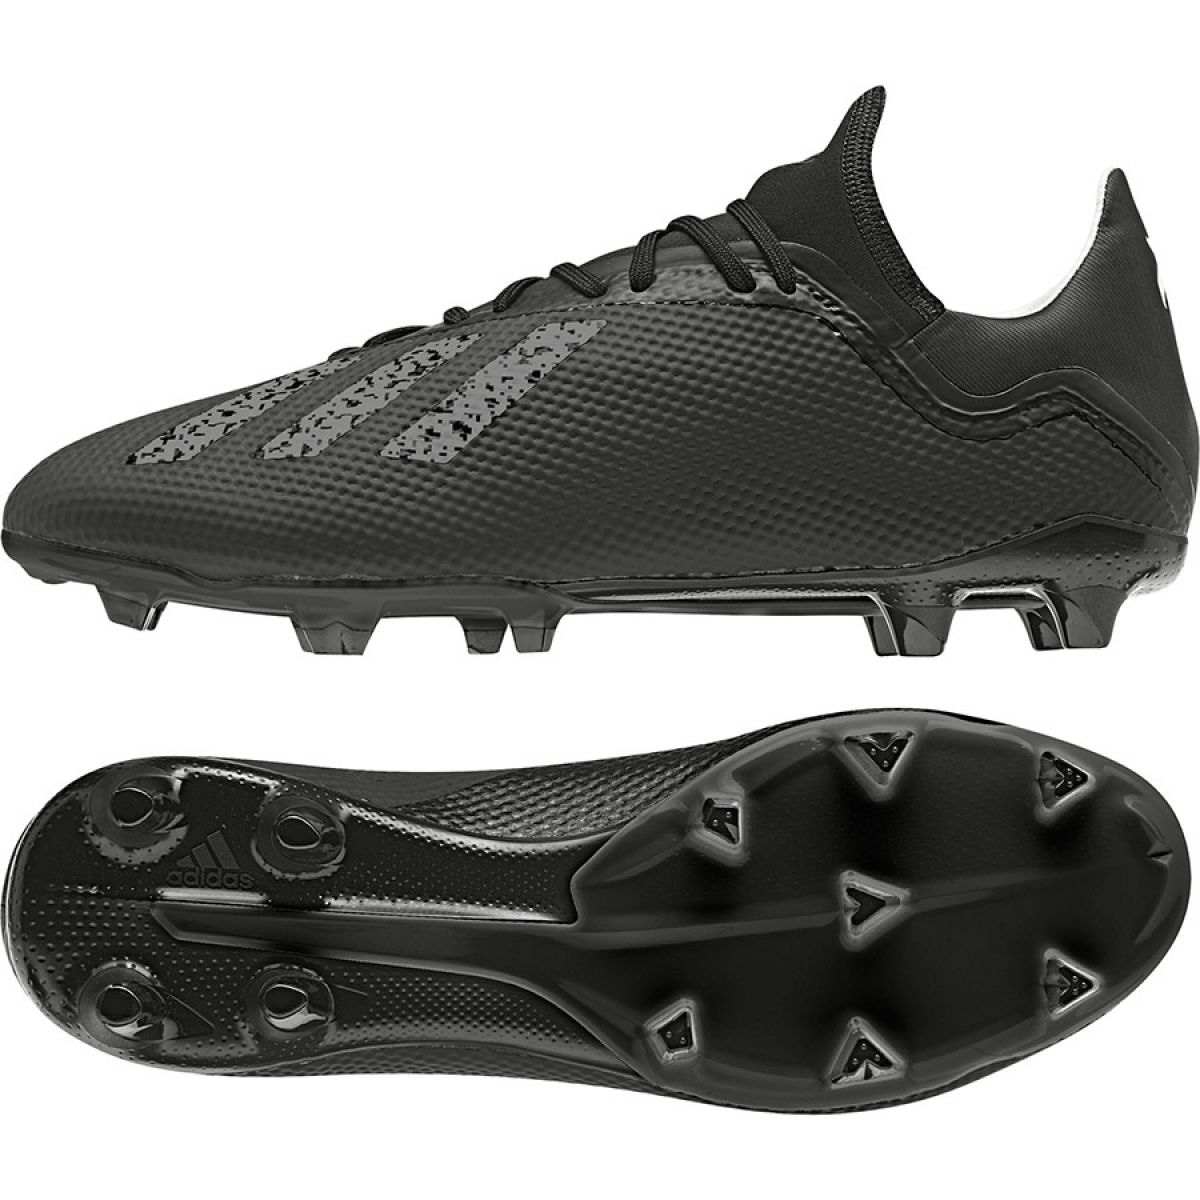 Daroga Noir Adidas Lea Plus Chaussures Homme SXdPqdw